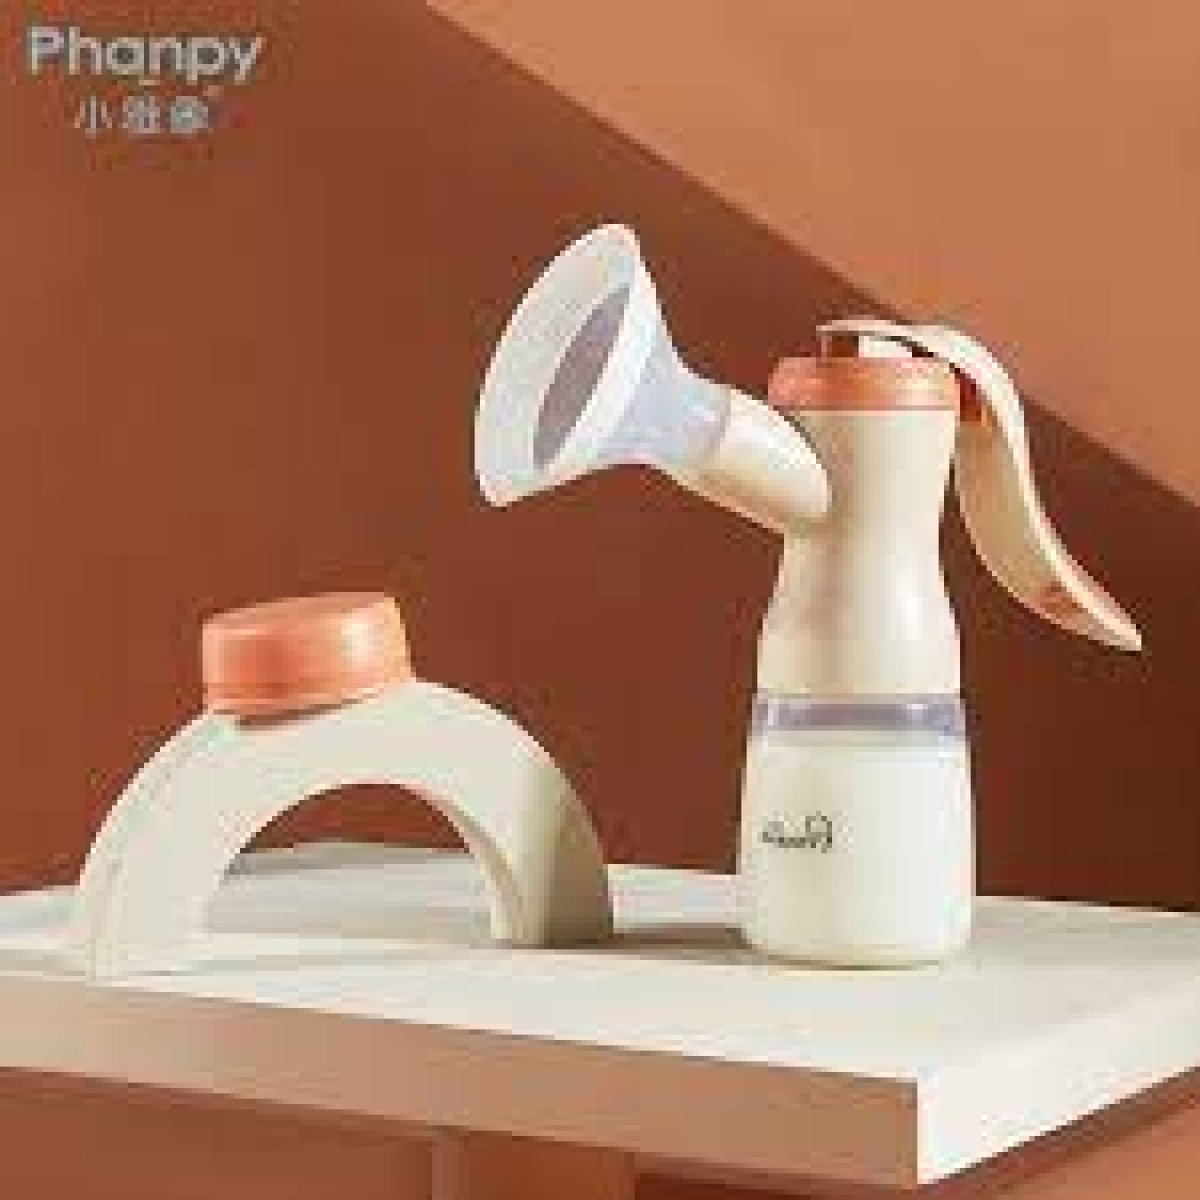 Phanpy Manual Pump - Kico Baby Center